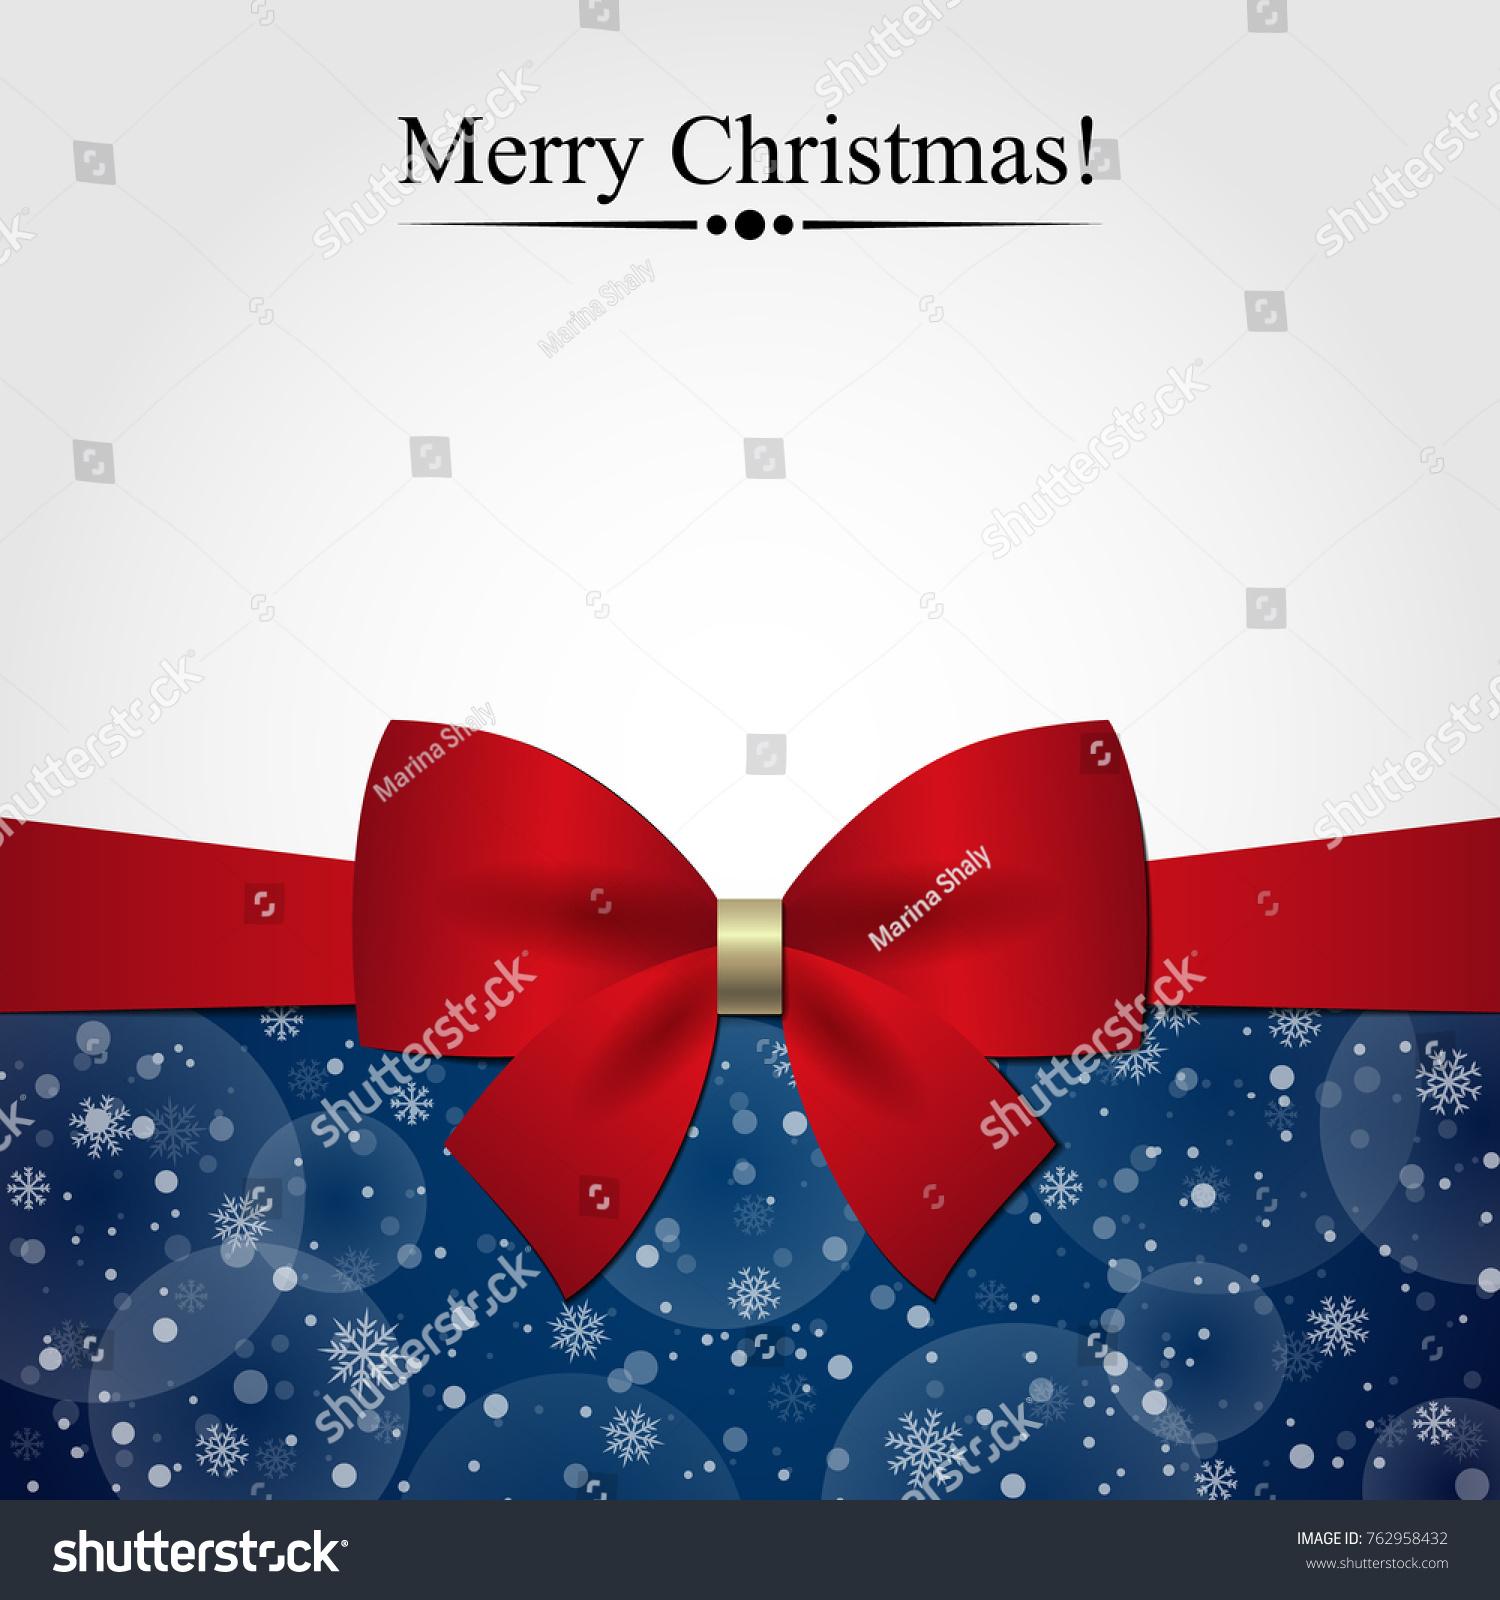 Merry christmas card vector illustration holiday stock vector merry christmas card vector illustration holiday decorative design for cards invitations vouchers kristyandbryce Gallery